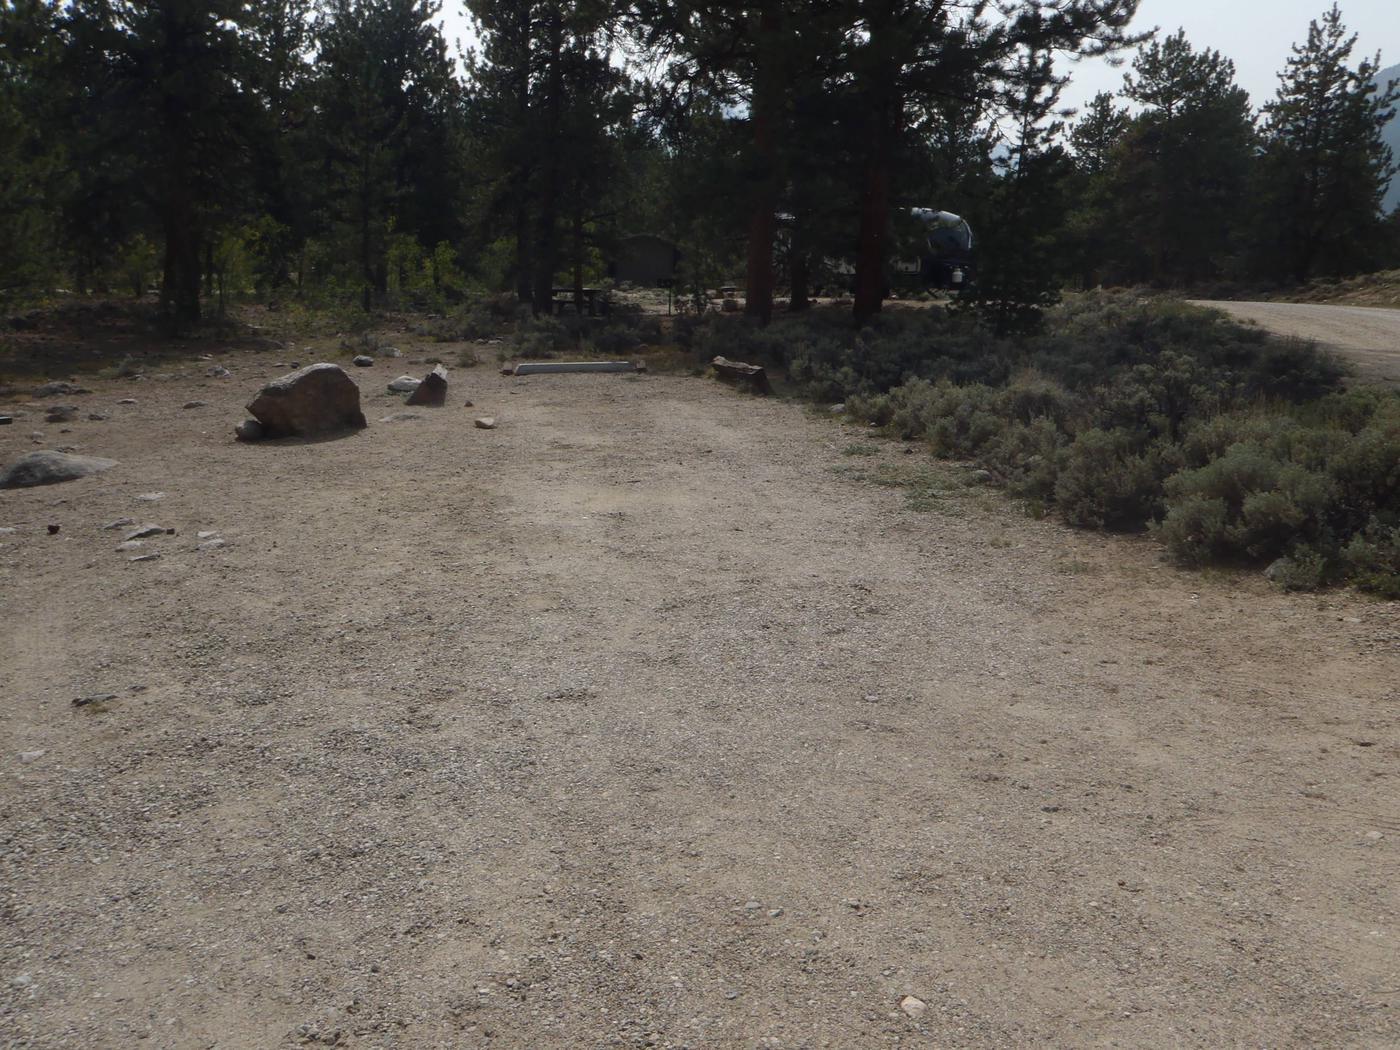 White Star Campground, site 61 parker